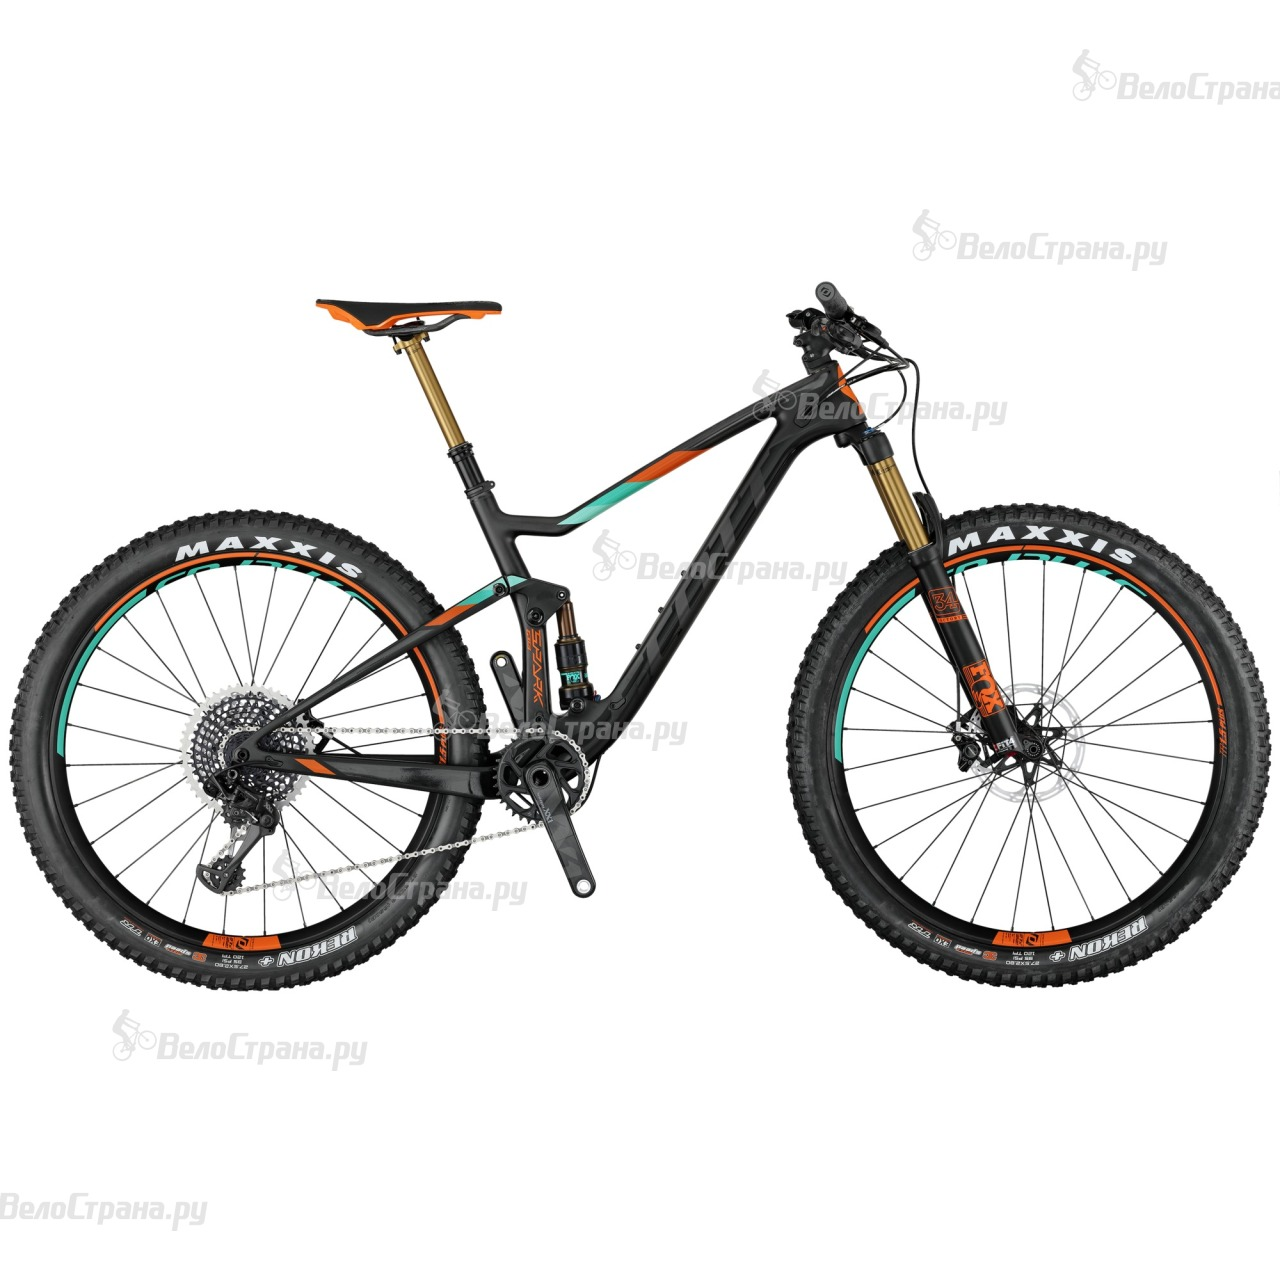 Велосипед Scott Spark 700 Plus Tuned (2017) велосипед scott genius lt 700 tuned plus 2016